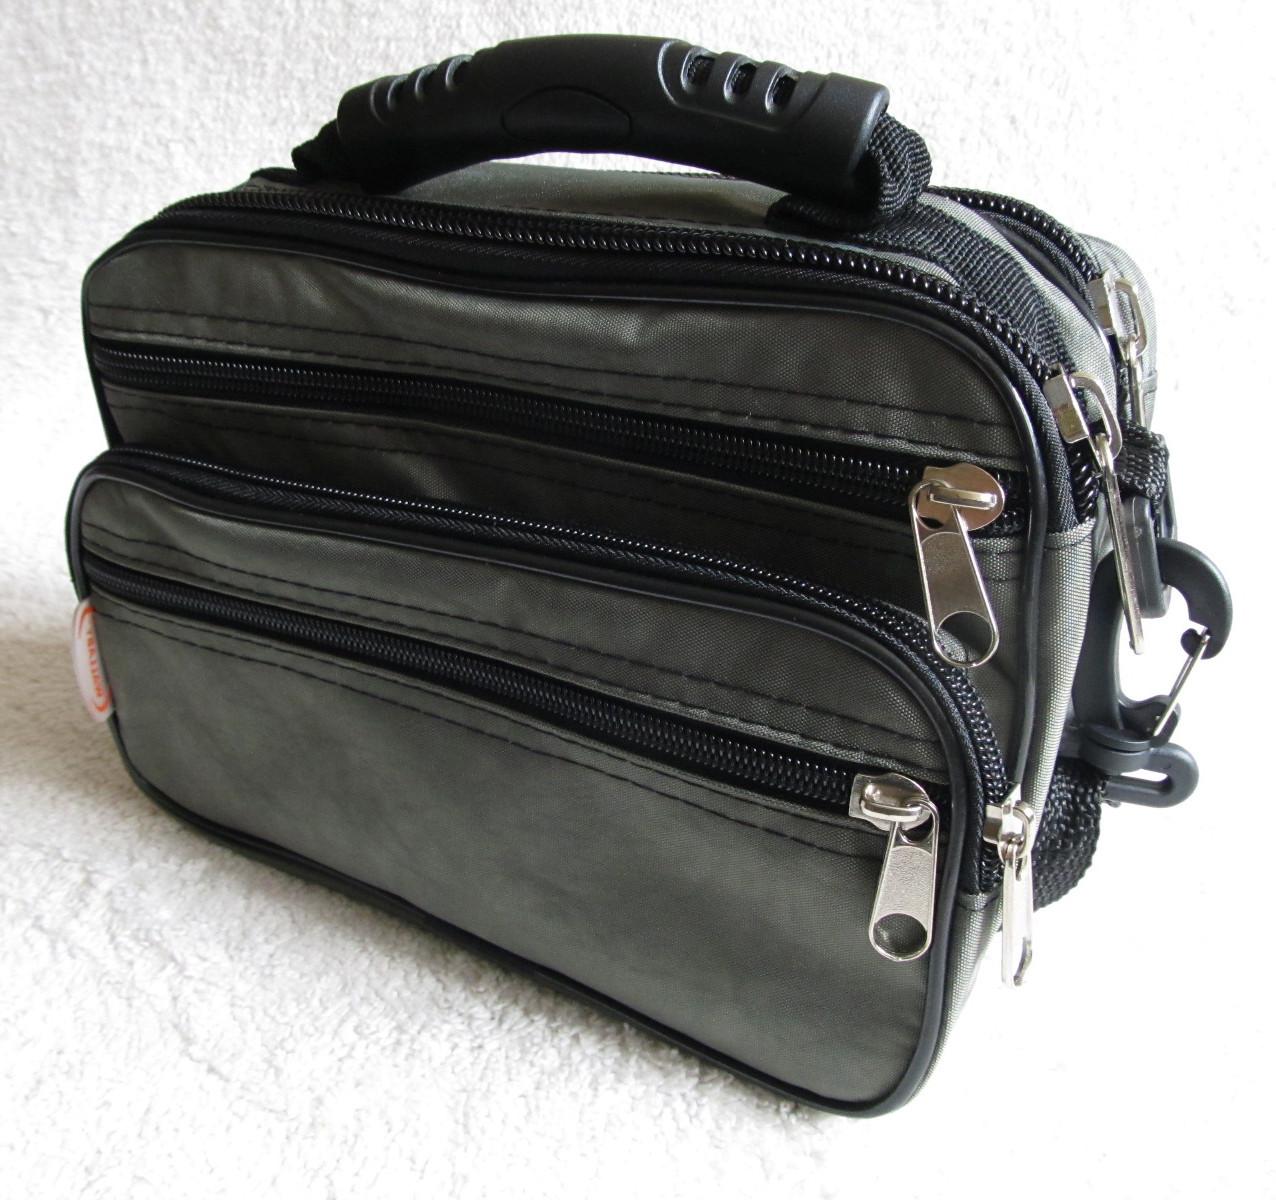 de94ec9a6967 Мужская сумка Wallaby21231 хаки барсетка через плечо 24х16х13см -  Интернет-магазин